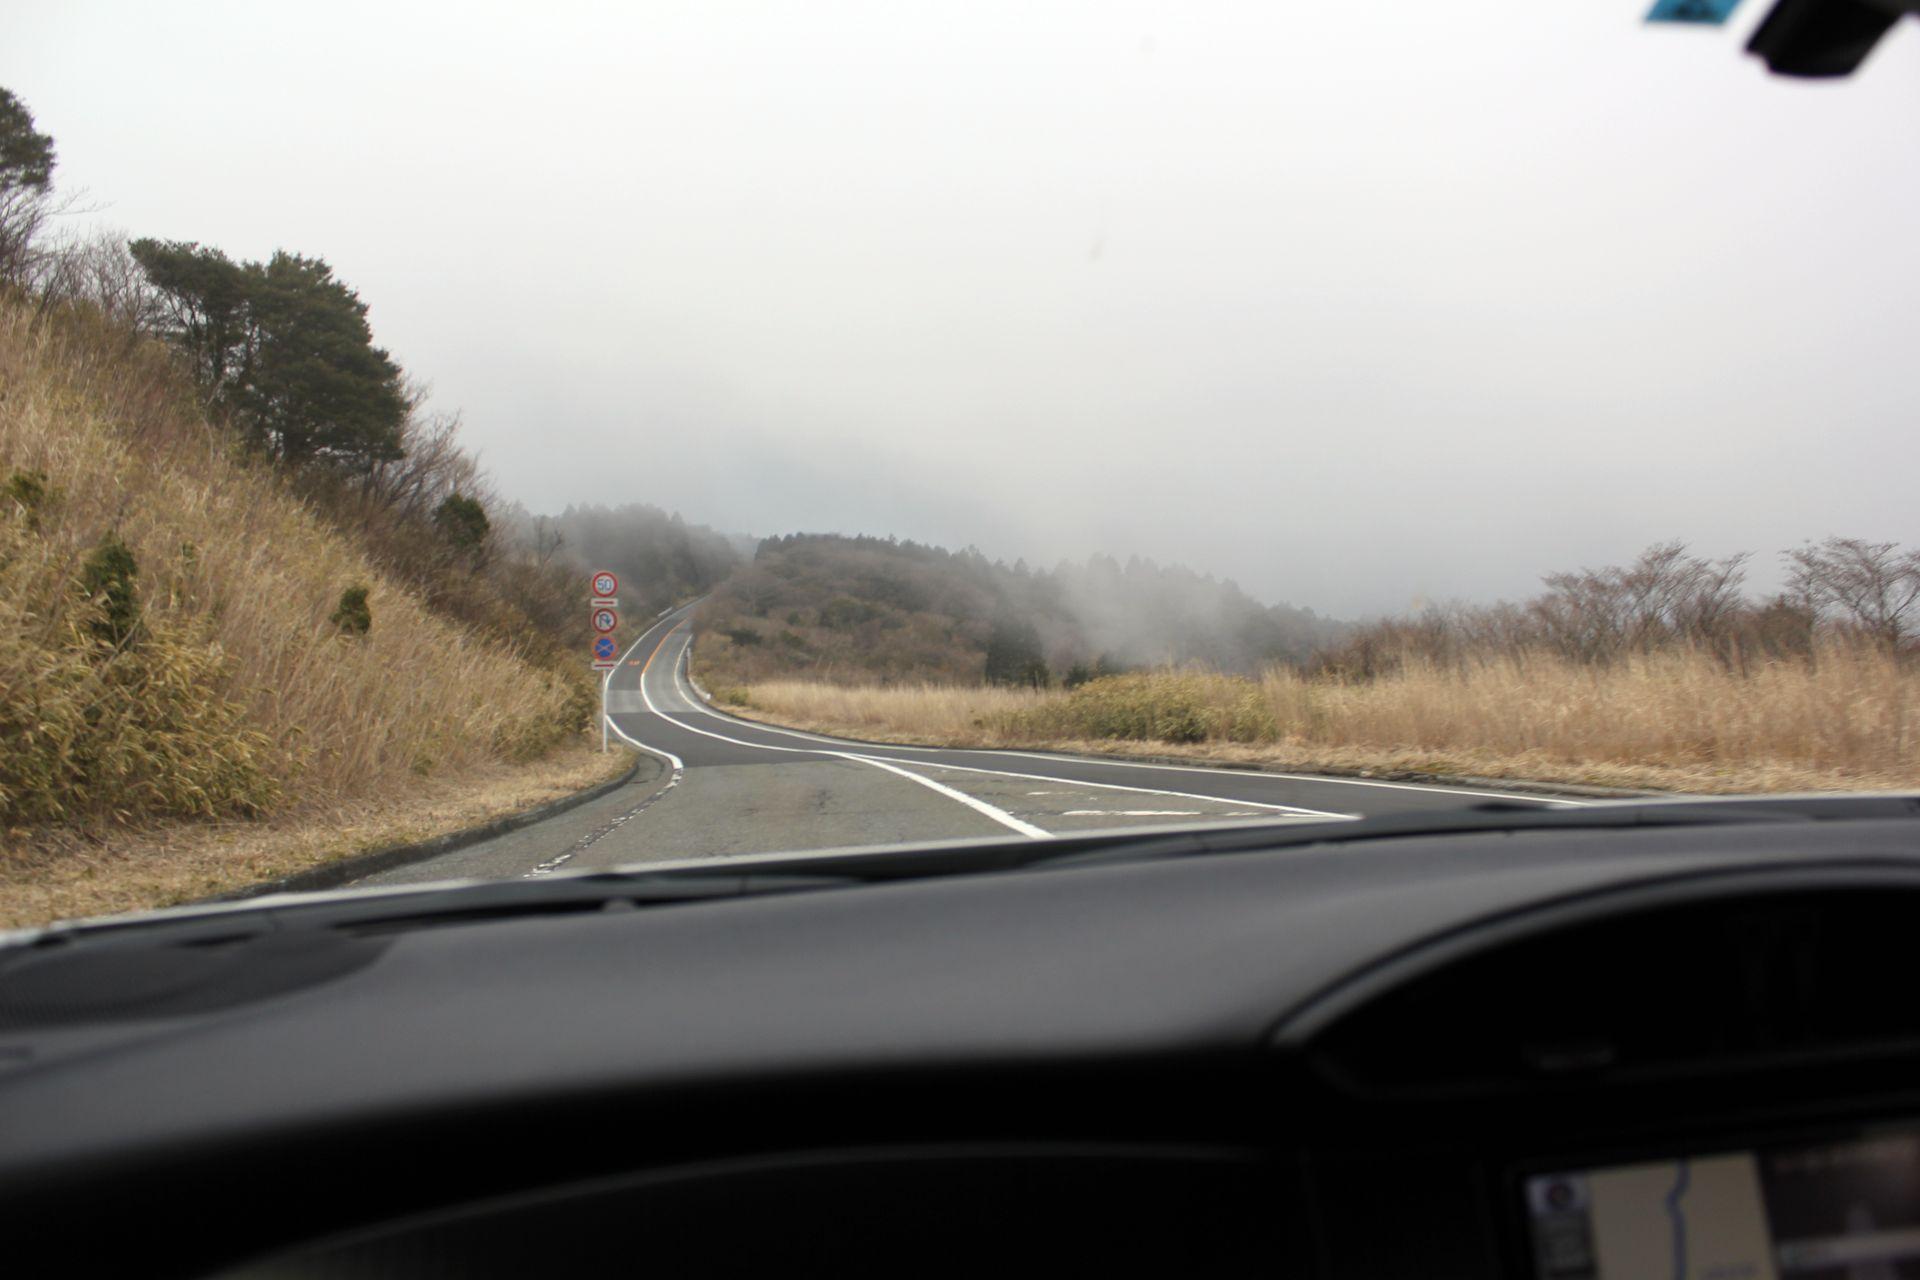 toyota 86 mountains winding road skyline